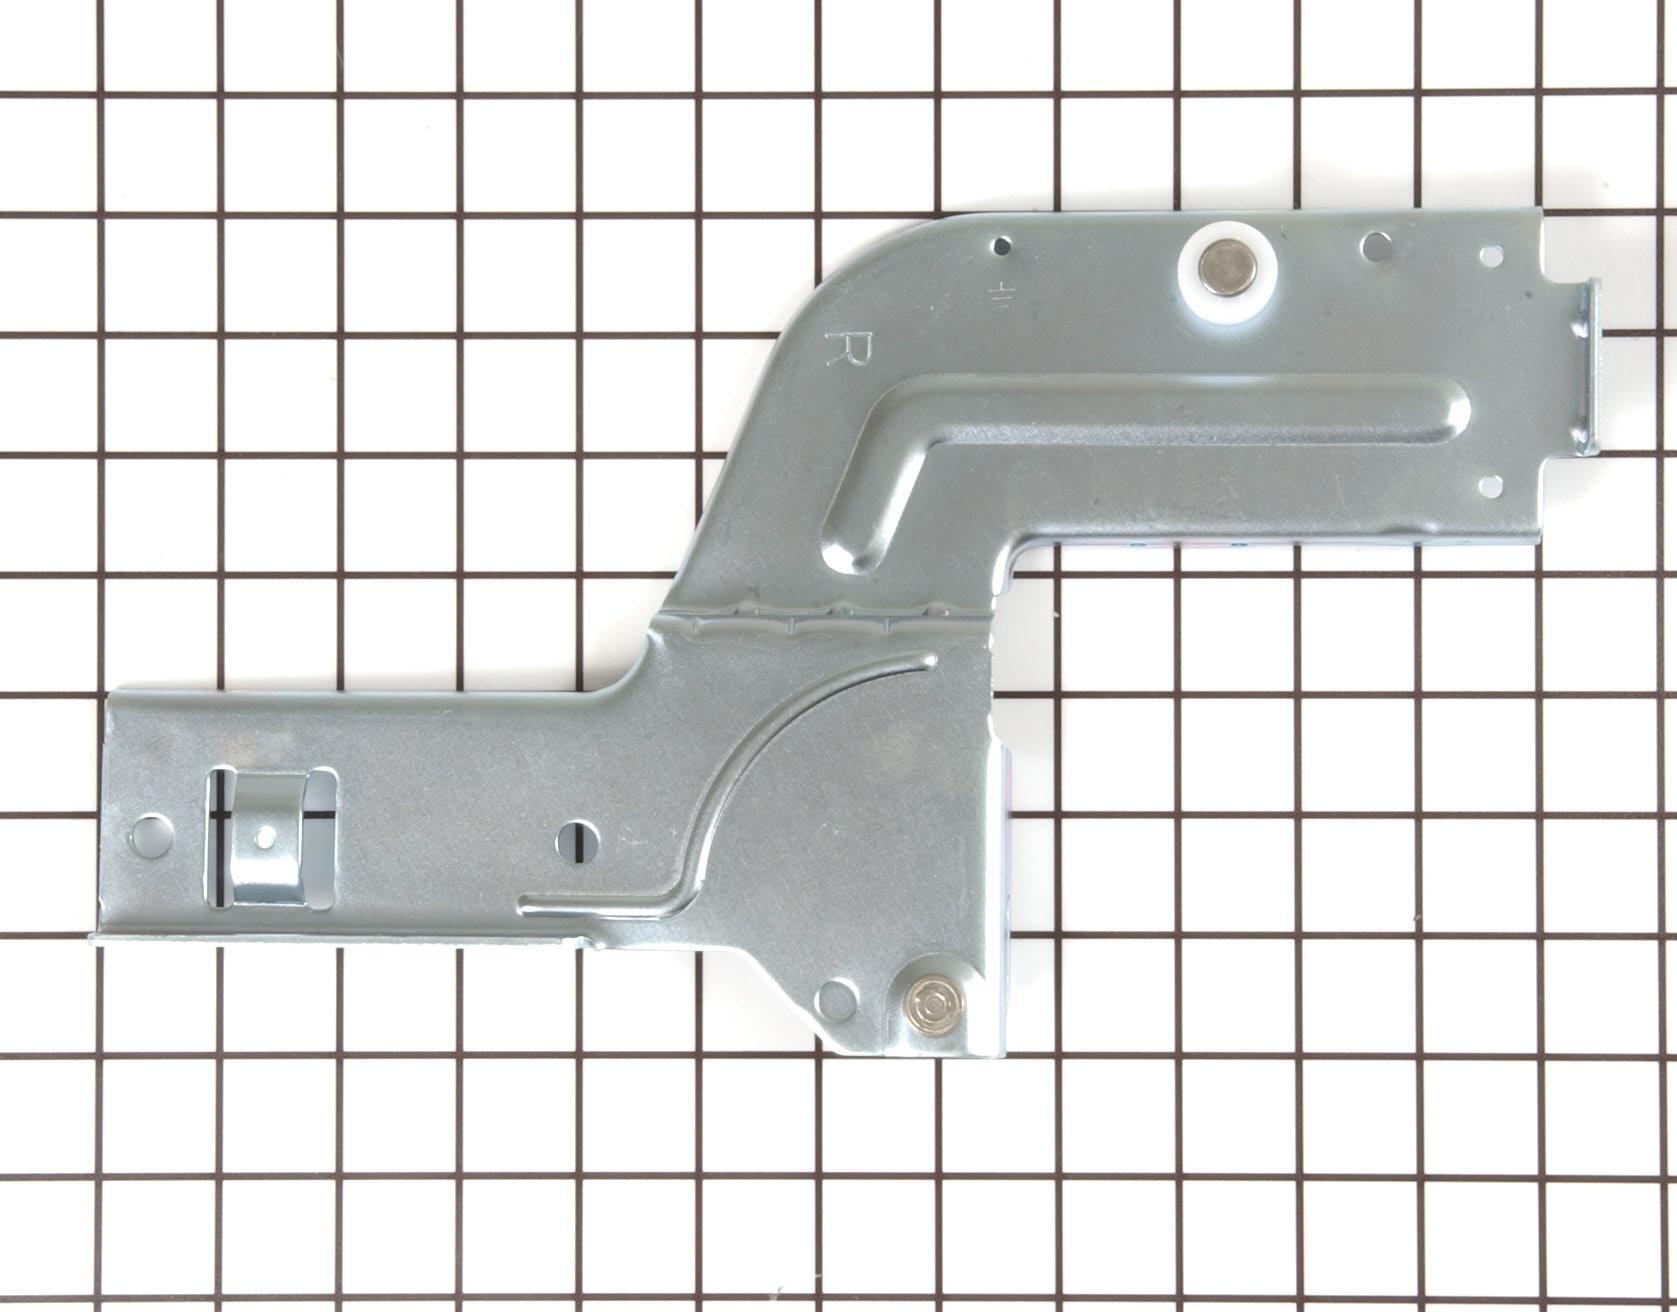 LG Dishwasher Part # 4775ED3004A - Door Hinge